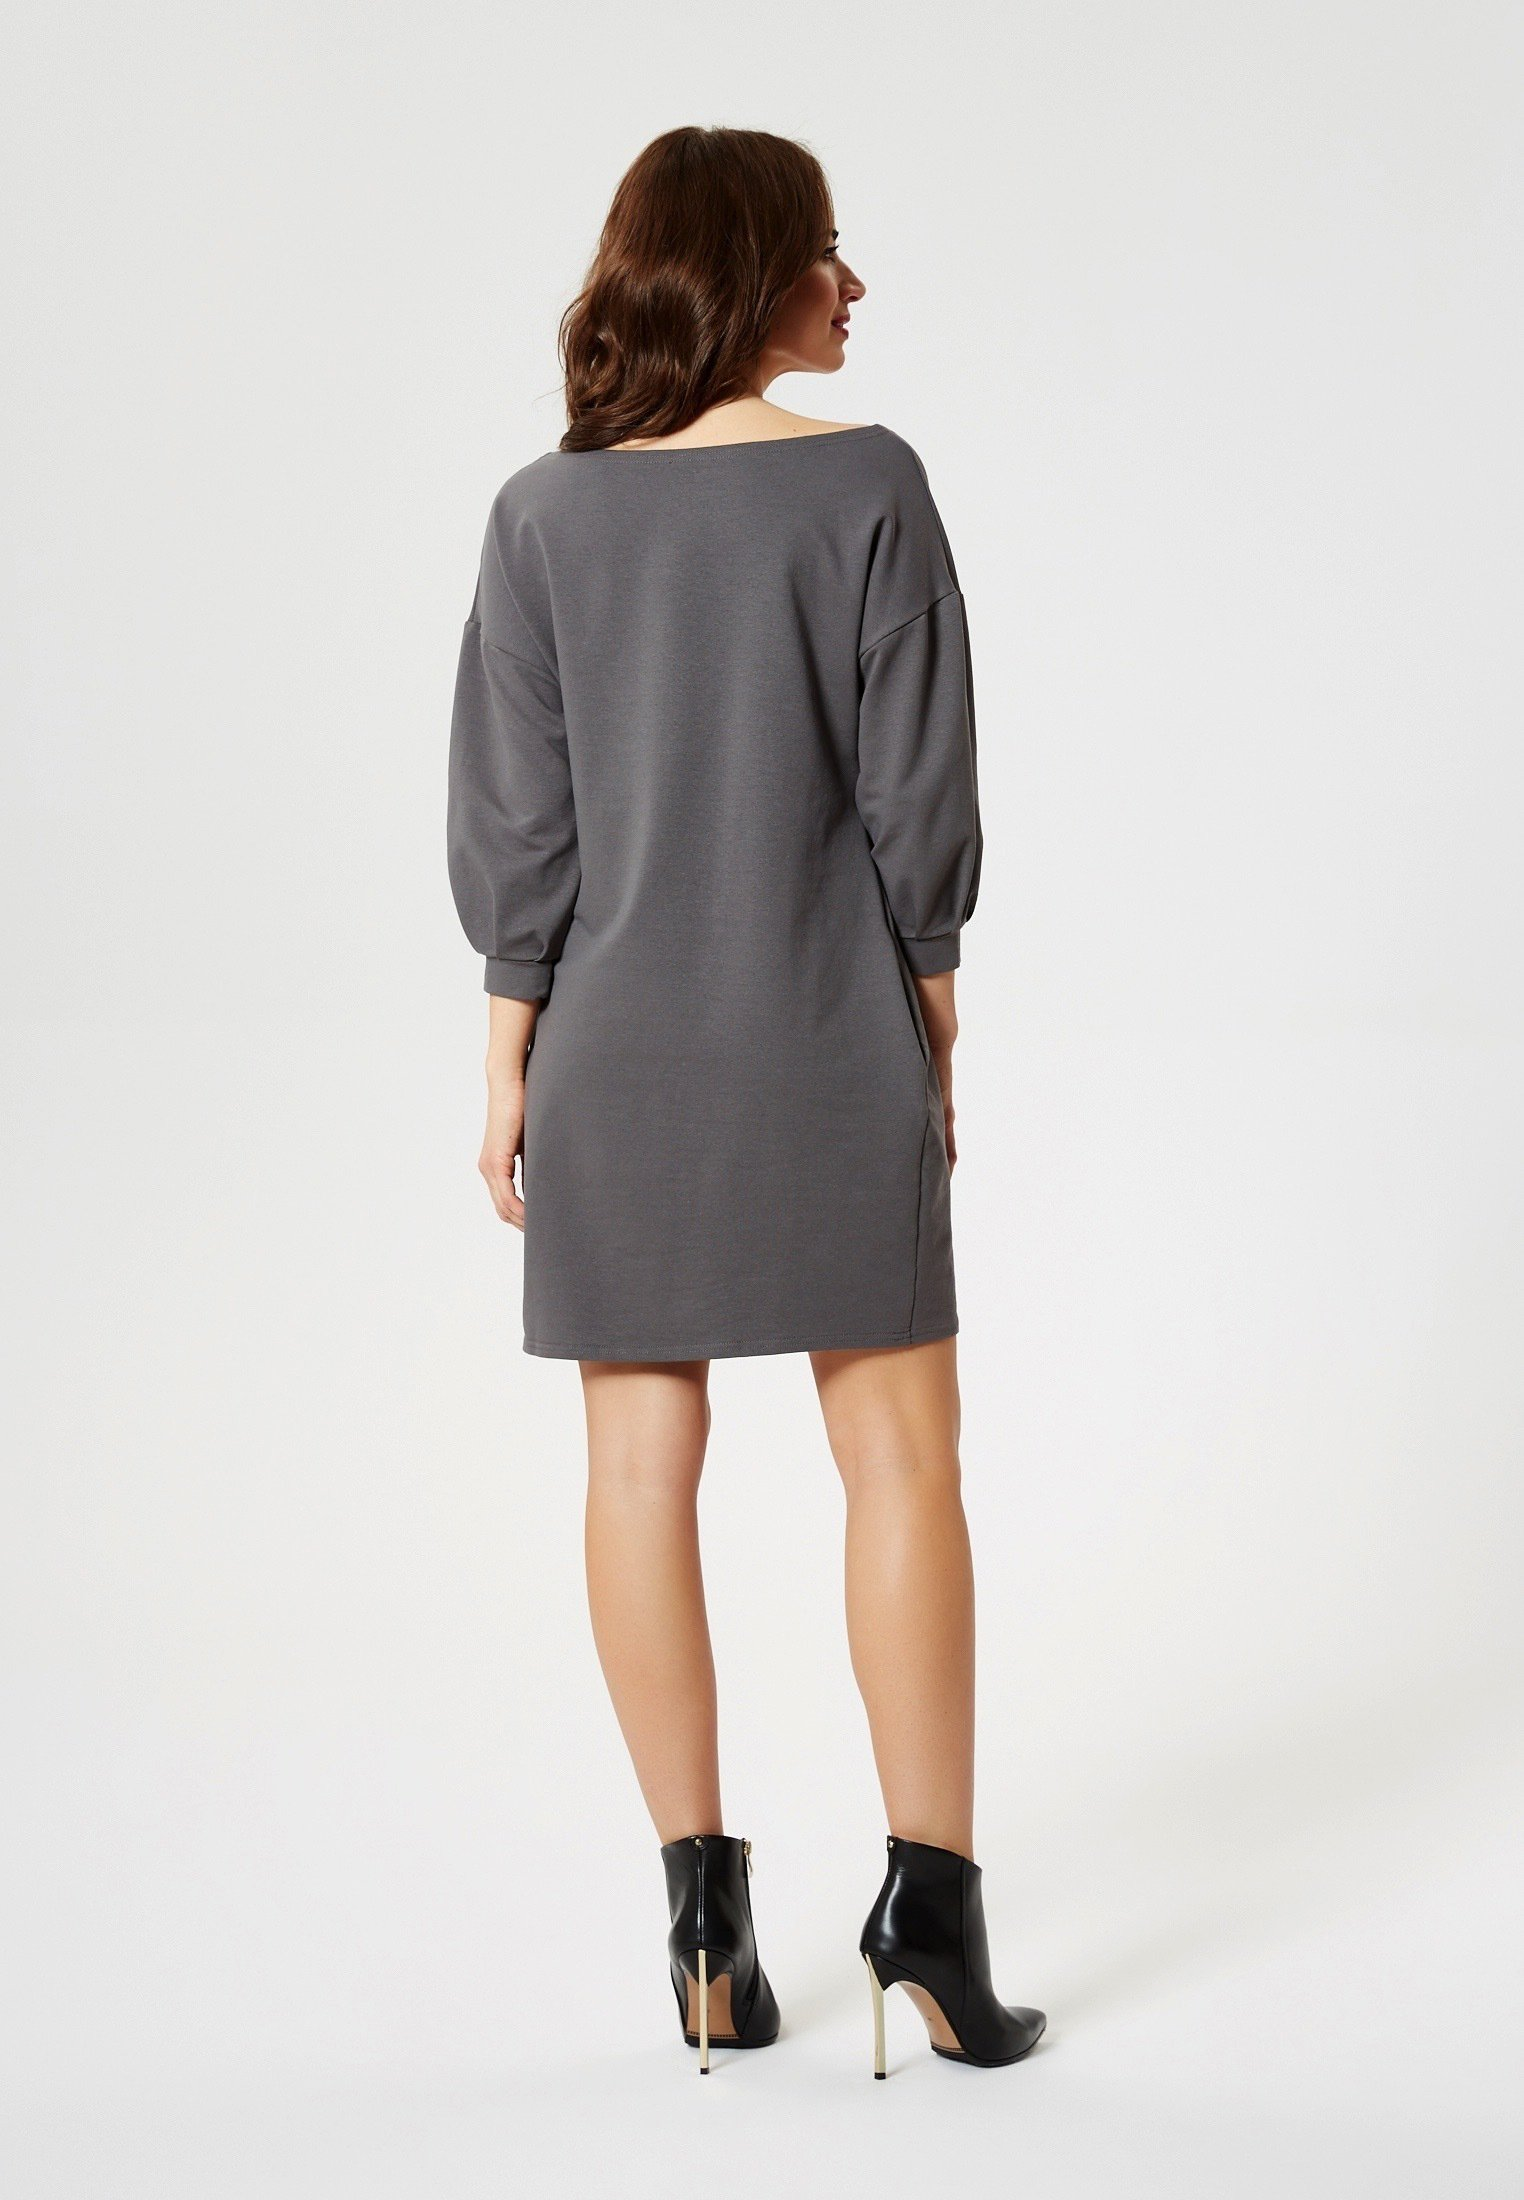 Discounts Women's Clothing faina Day dress graphite e90TiIiRQ